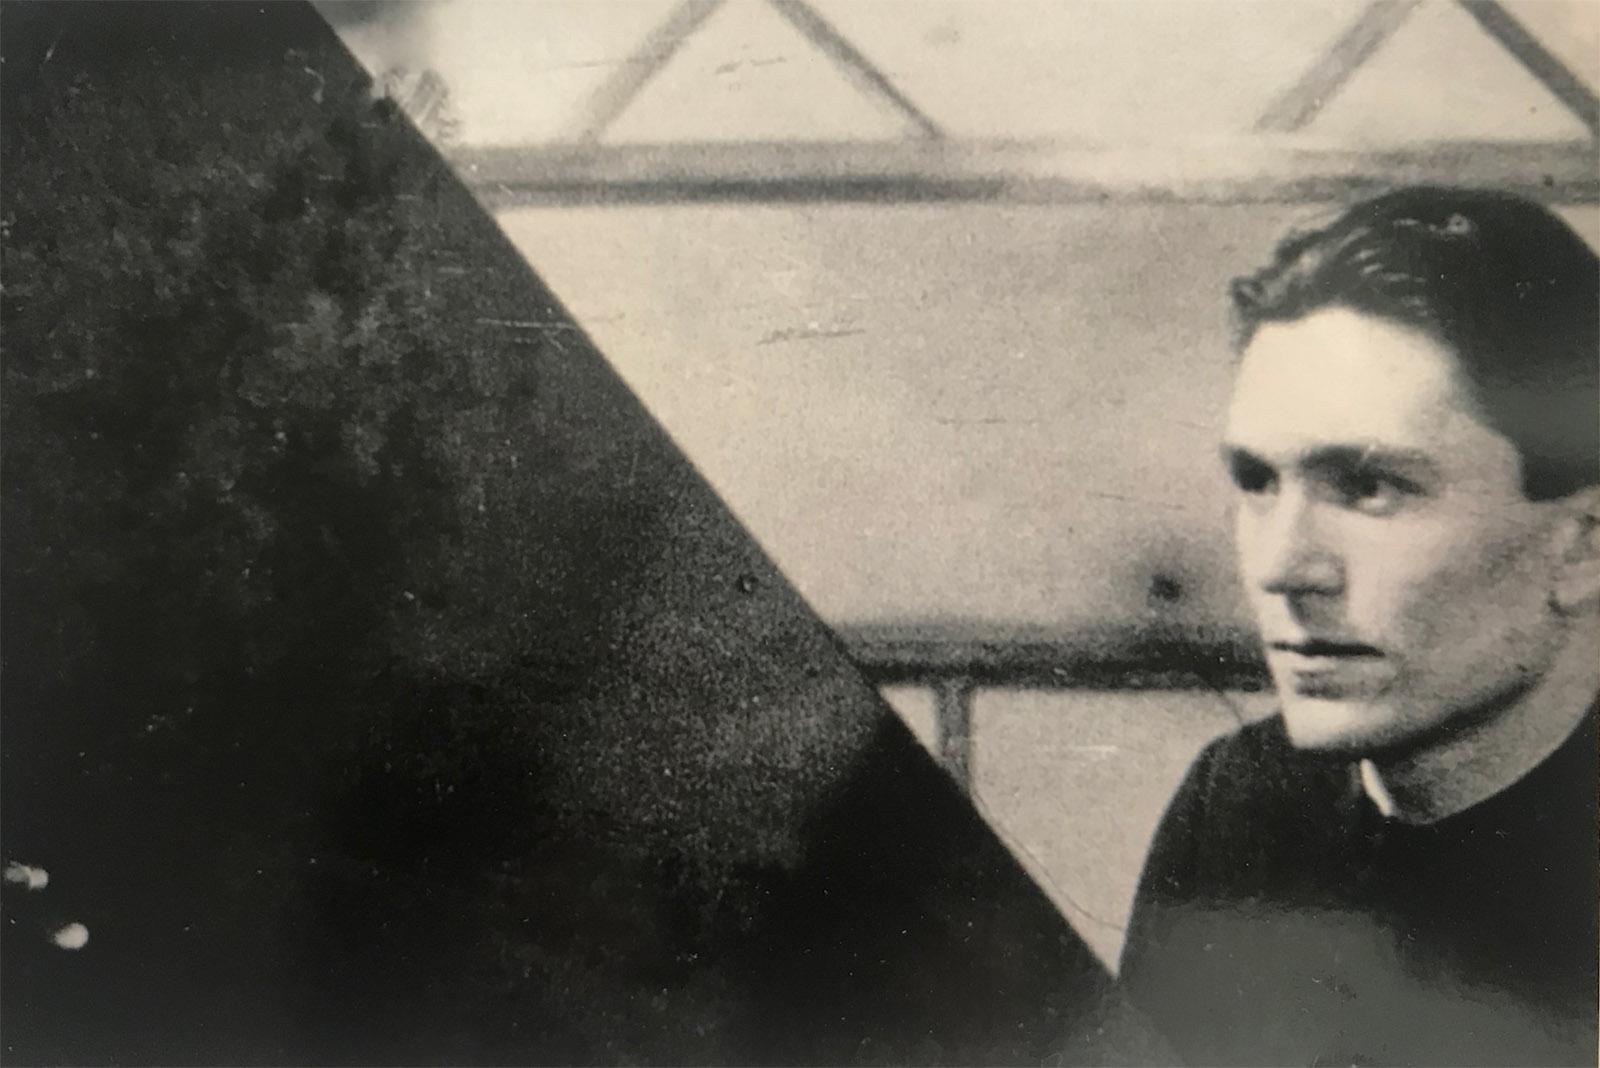 Shostakovich, My Grandfather, and the Chimes of Novorossiysk